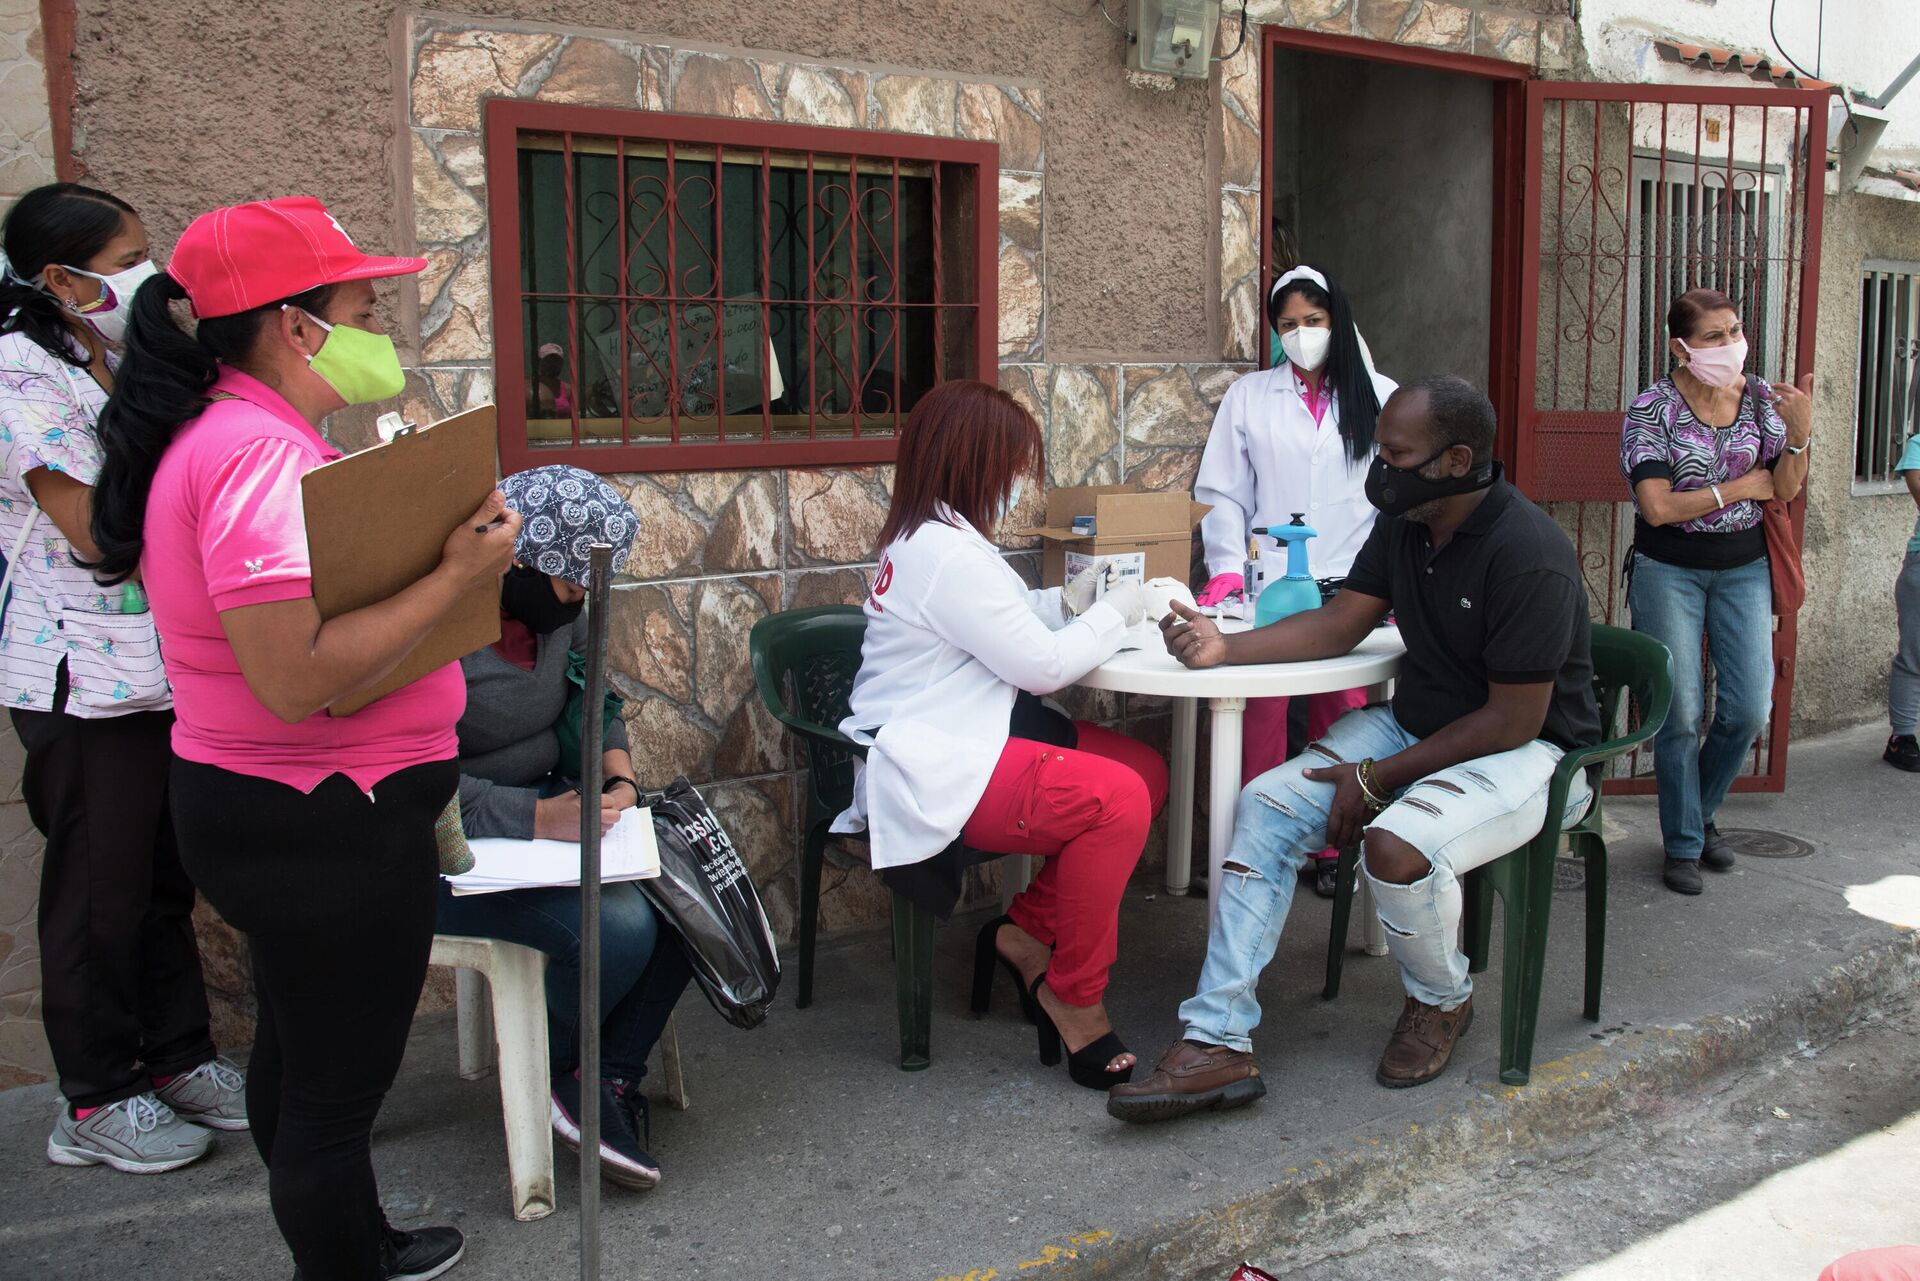 Personal médico realiza recorrido por favelas de Caracas para identificar y aislar casos de COVID-19 - Sputnik Mundo, 1920, 13.03.2021